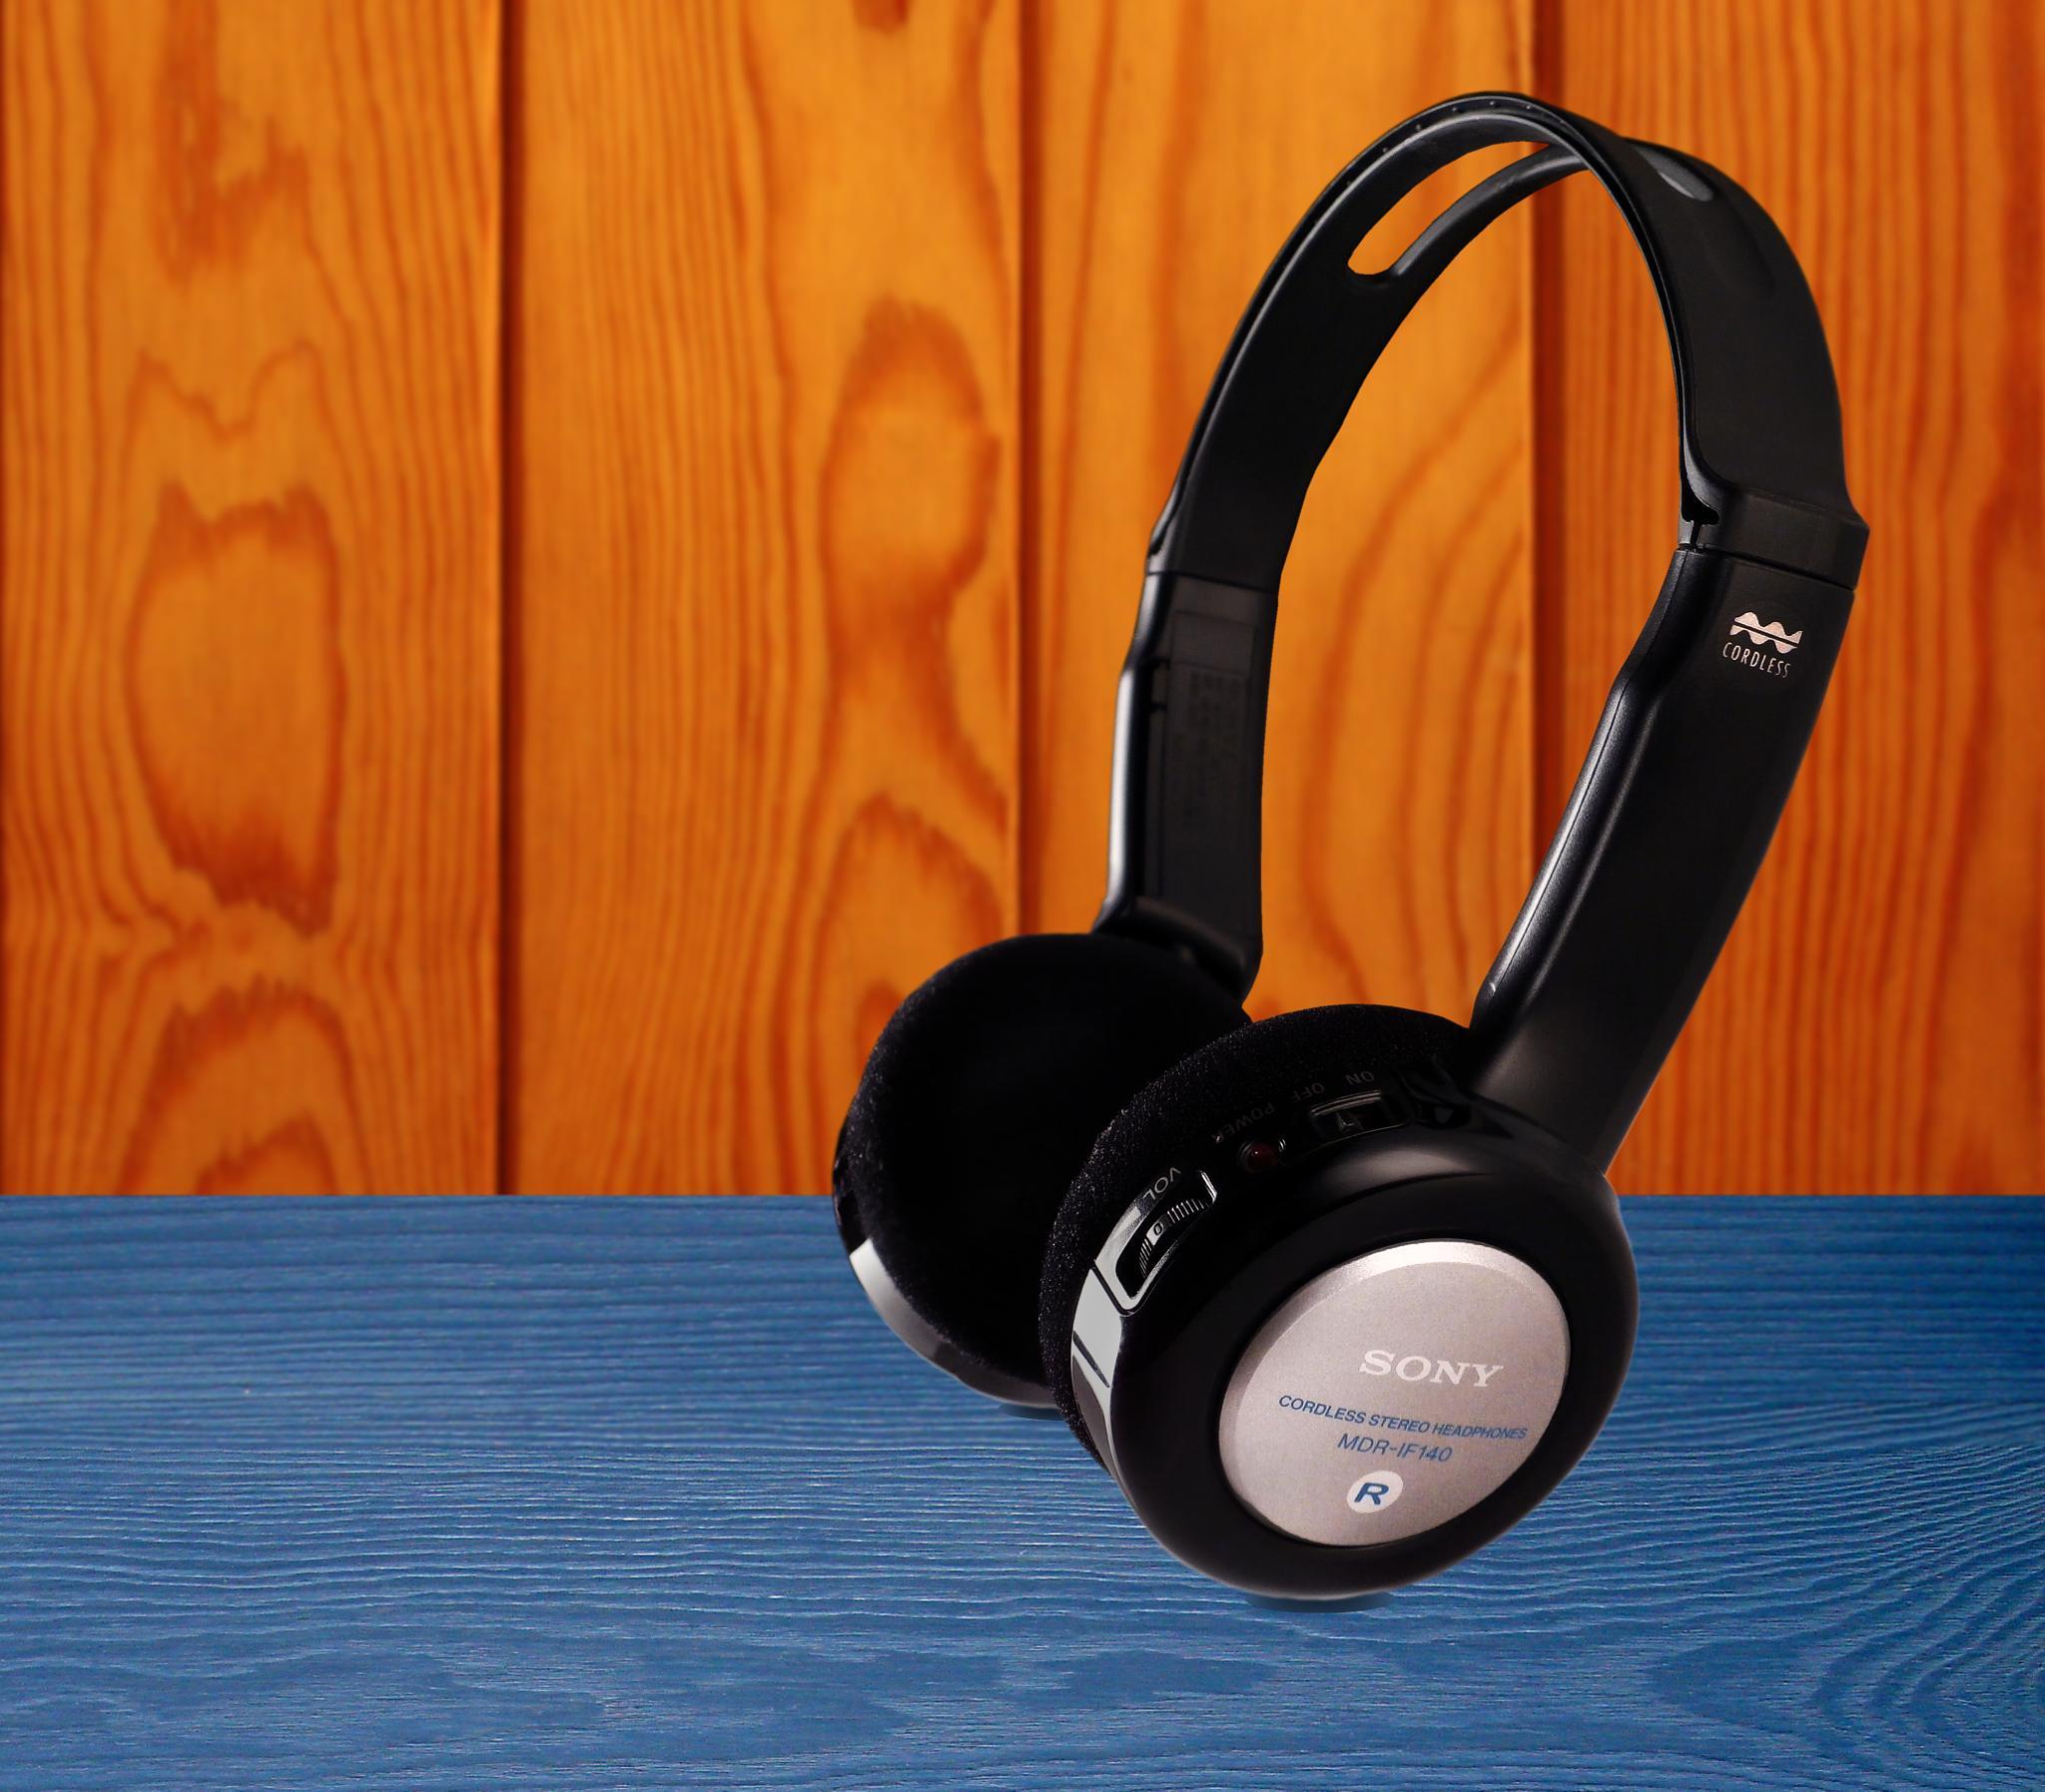 Sony Headphone...... by Reuben Kinny